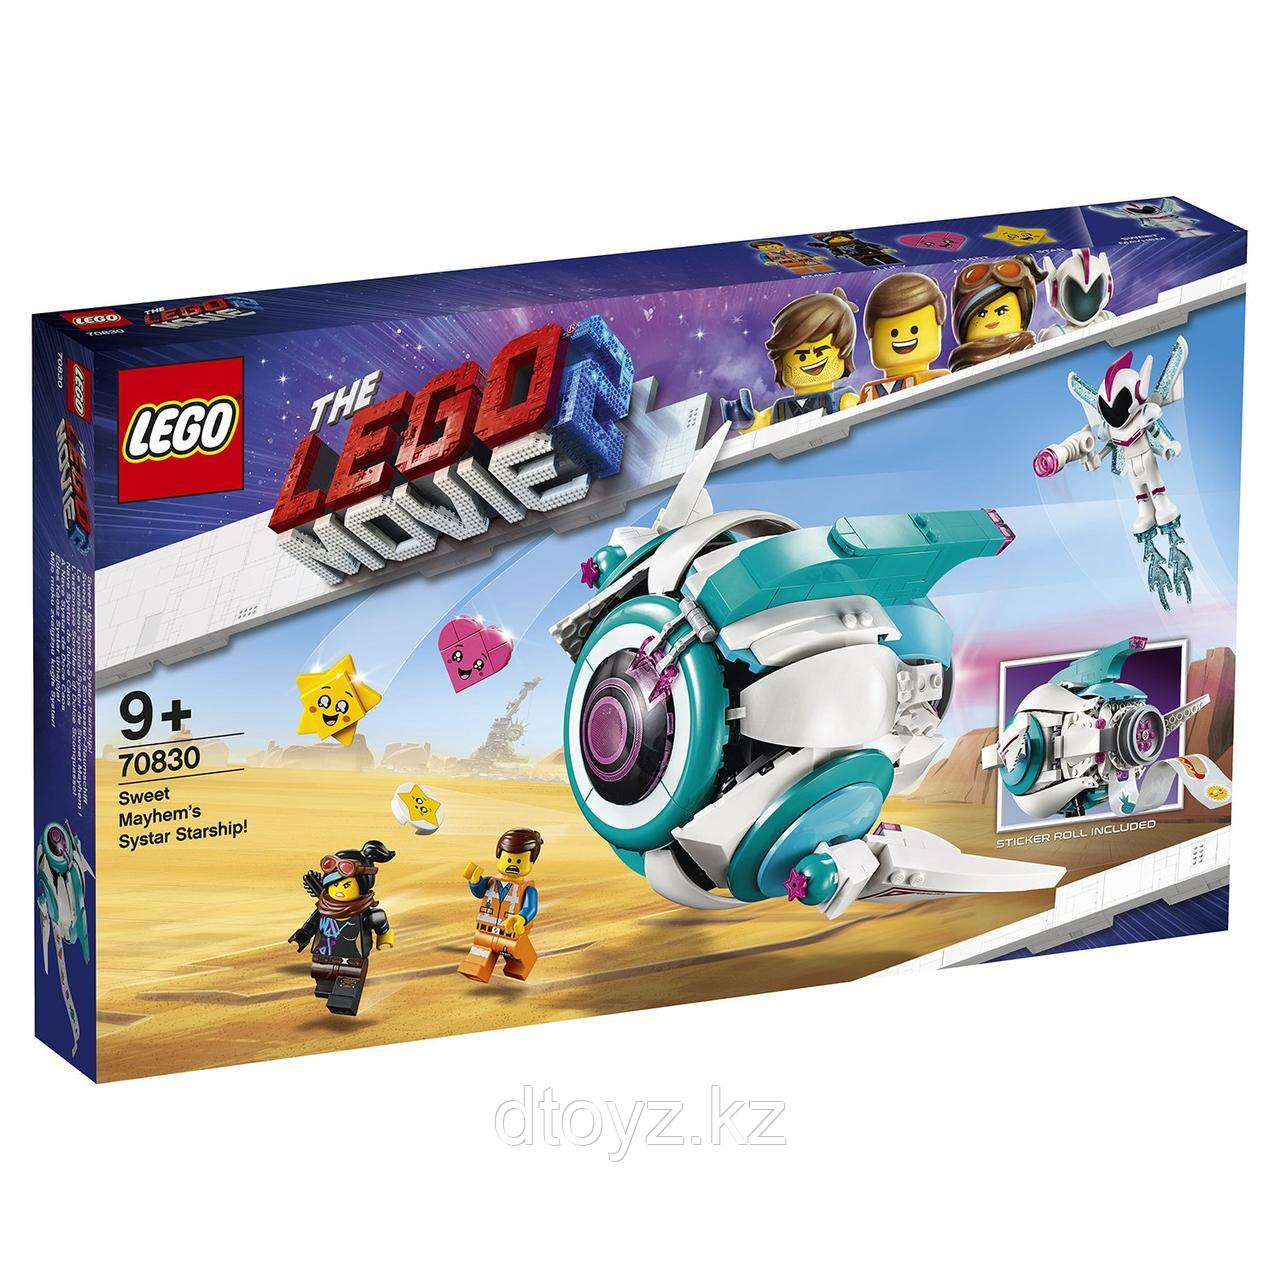 70830 LEGO Movie Падруженский Звездолёт Мими Катавасии